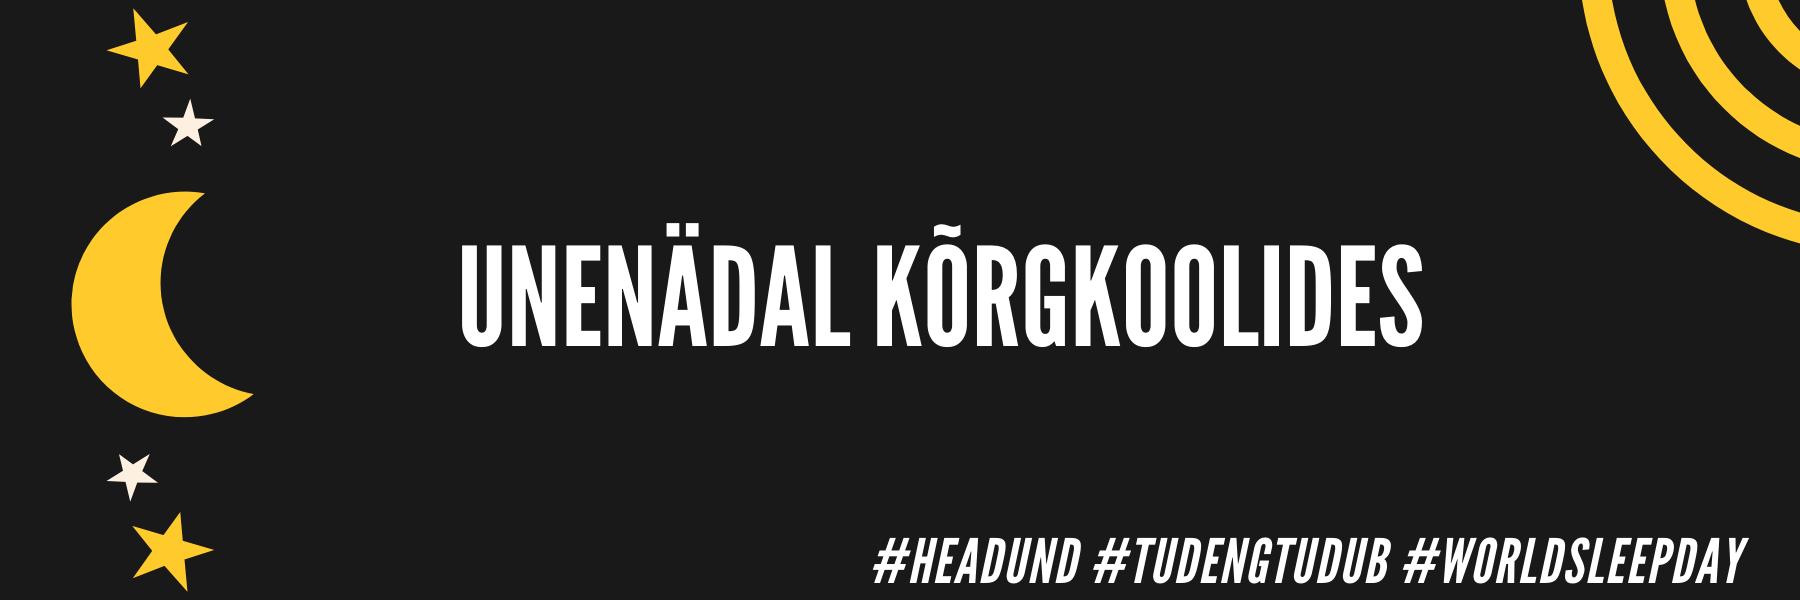 #headund